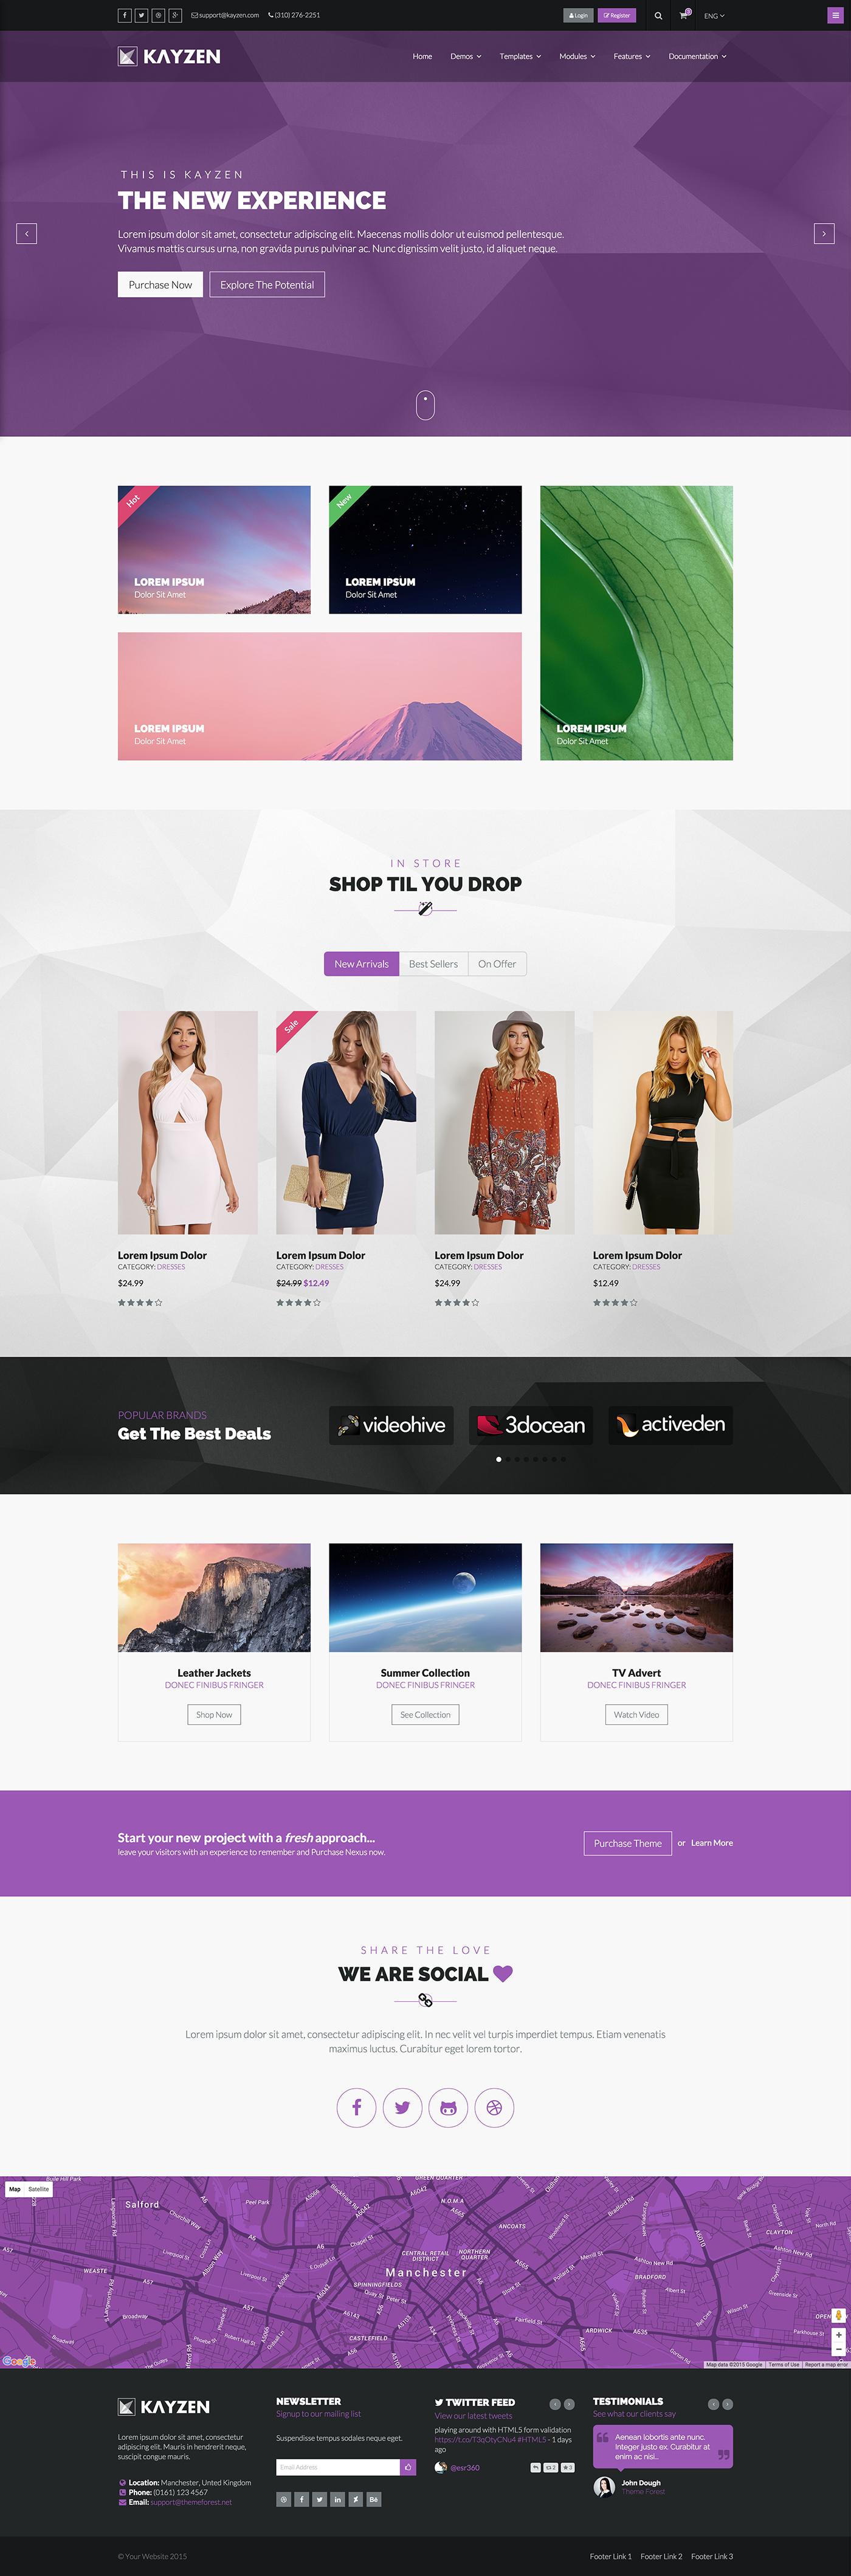 Homepage 5 copy